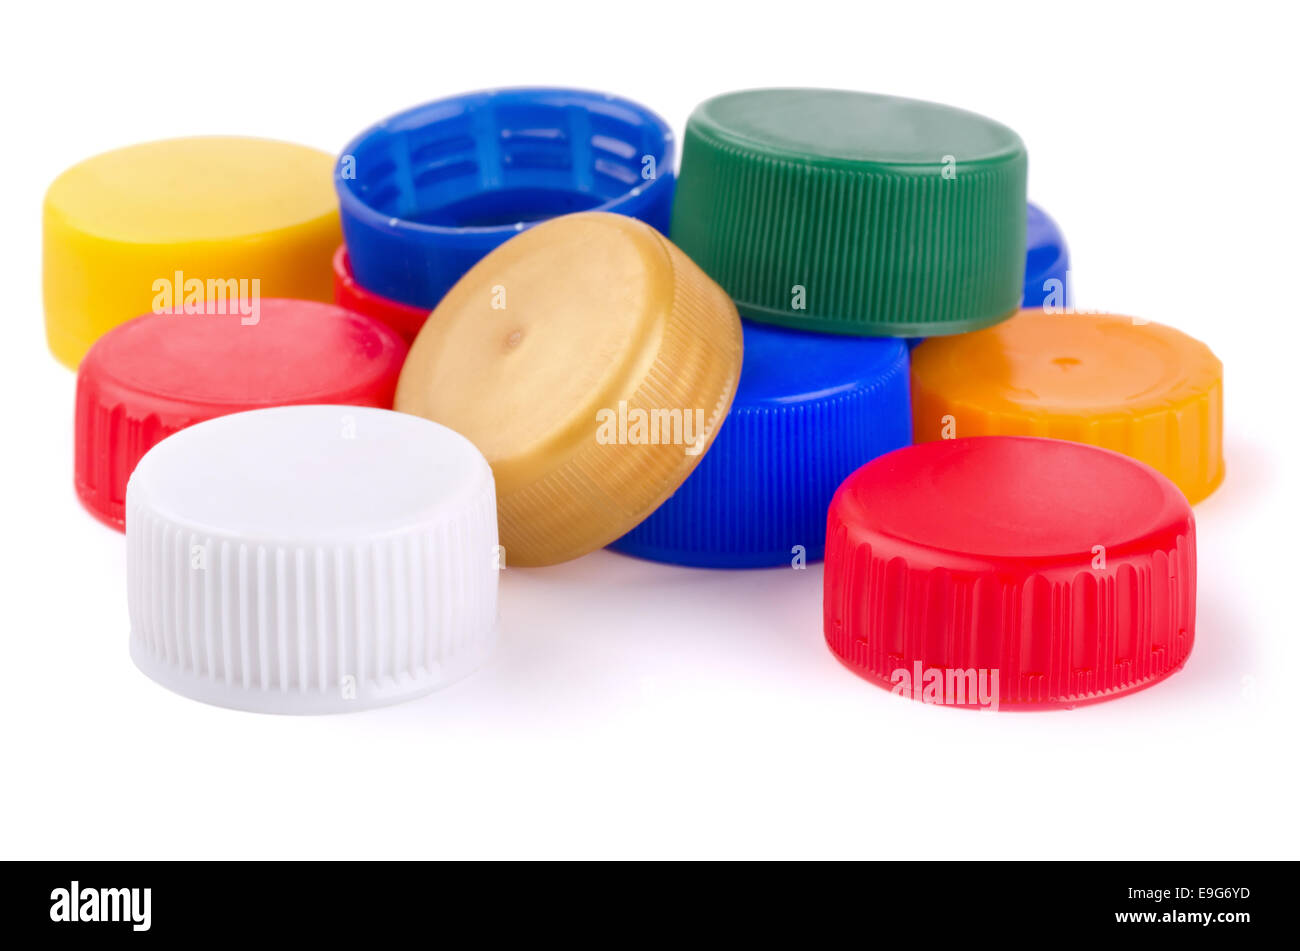 Bottle caps - Stock Image